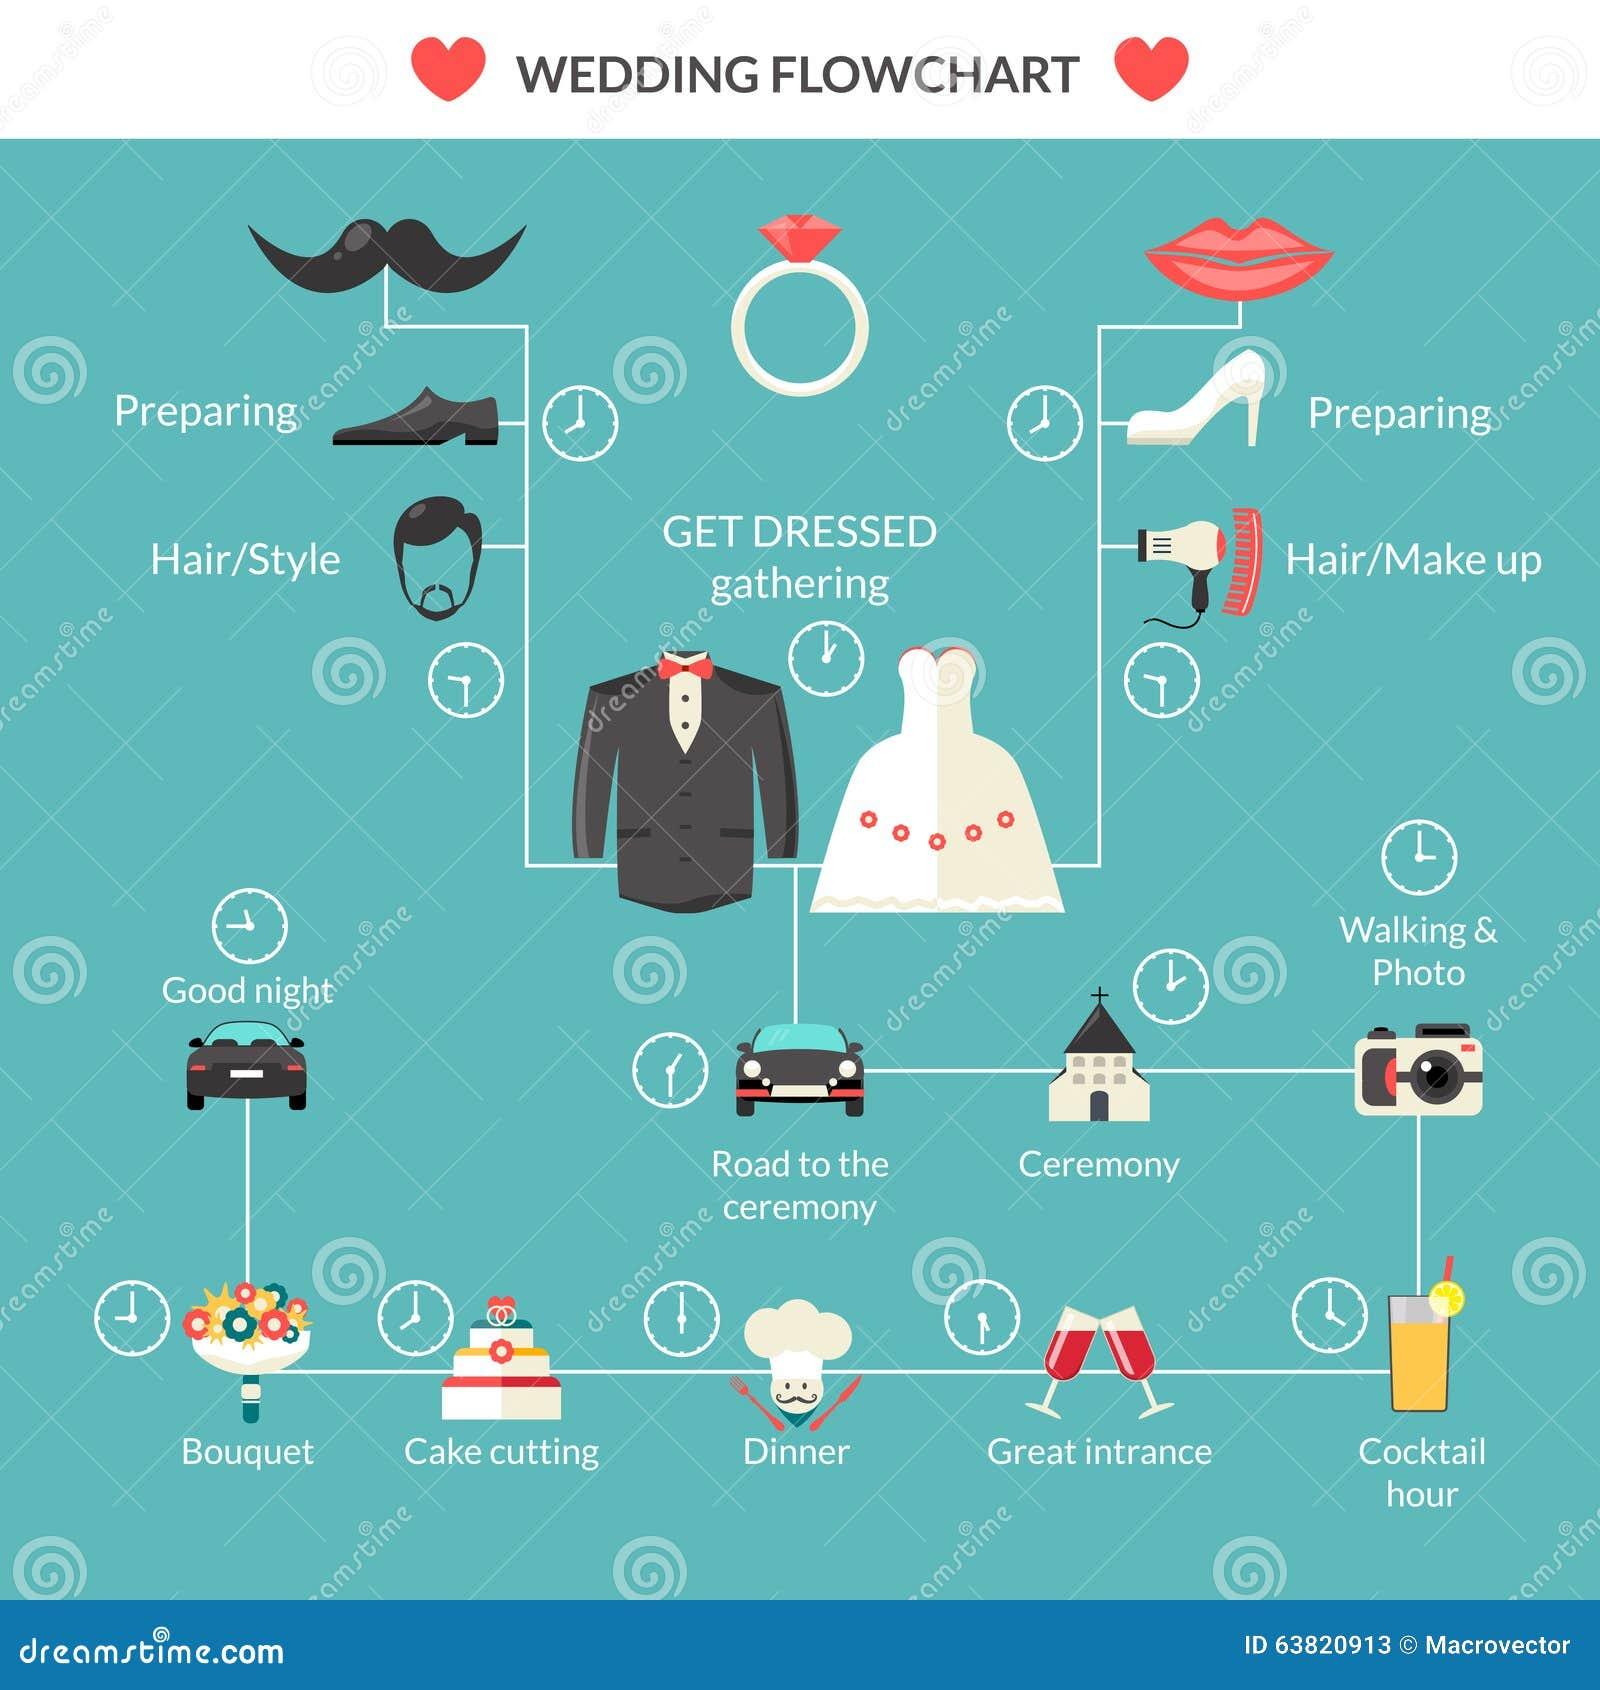 Wedding Reception Flow Of Events Switchmusicgroup Com